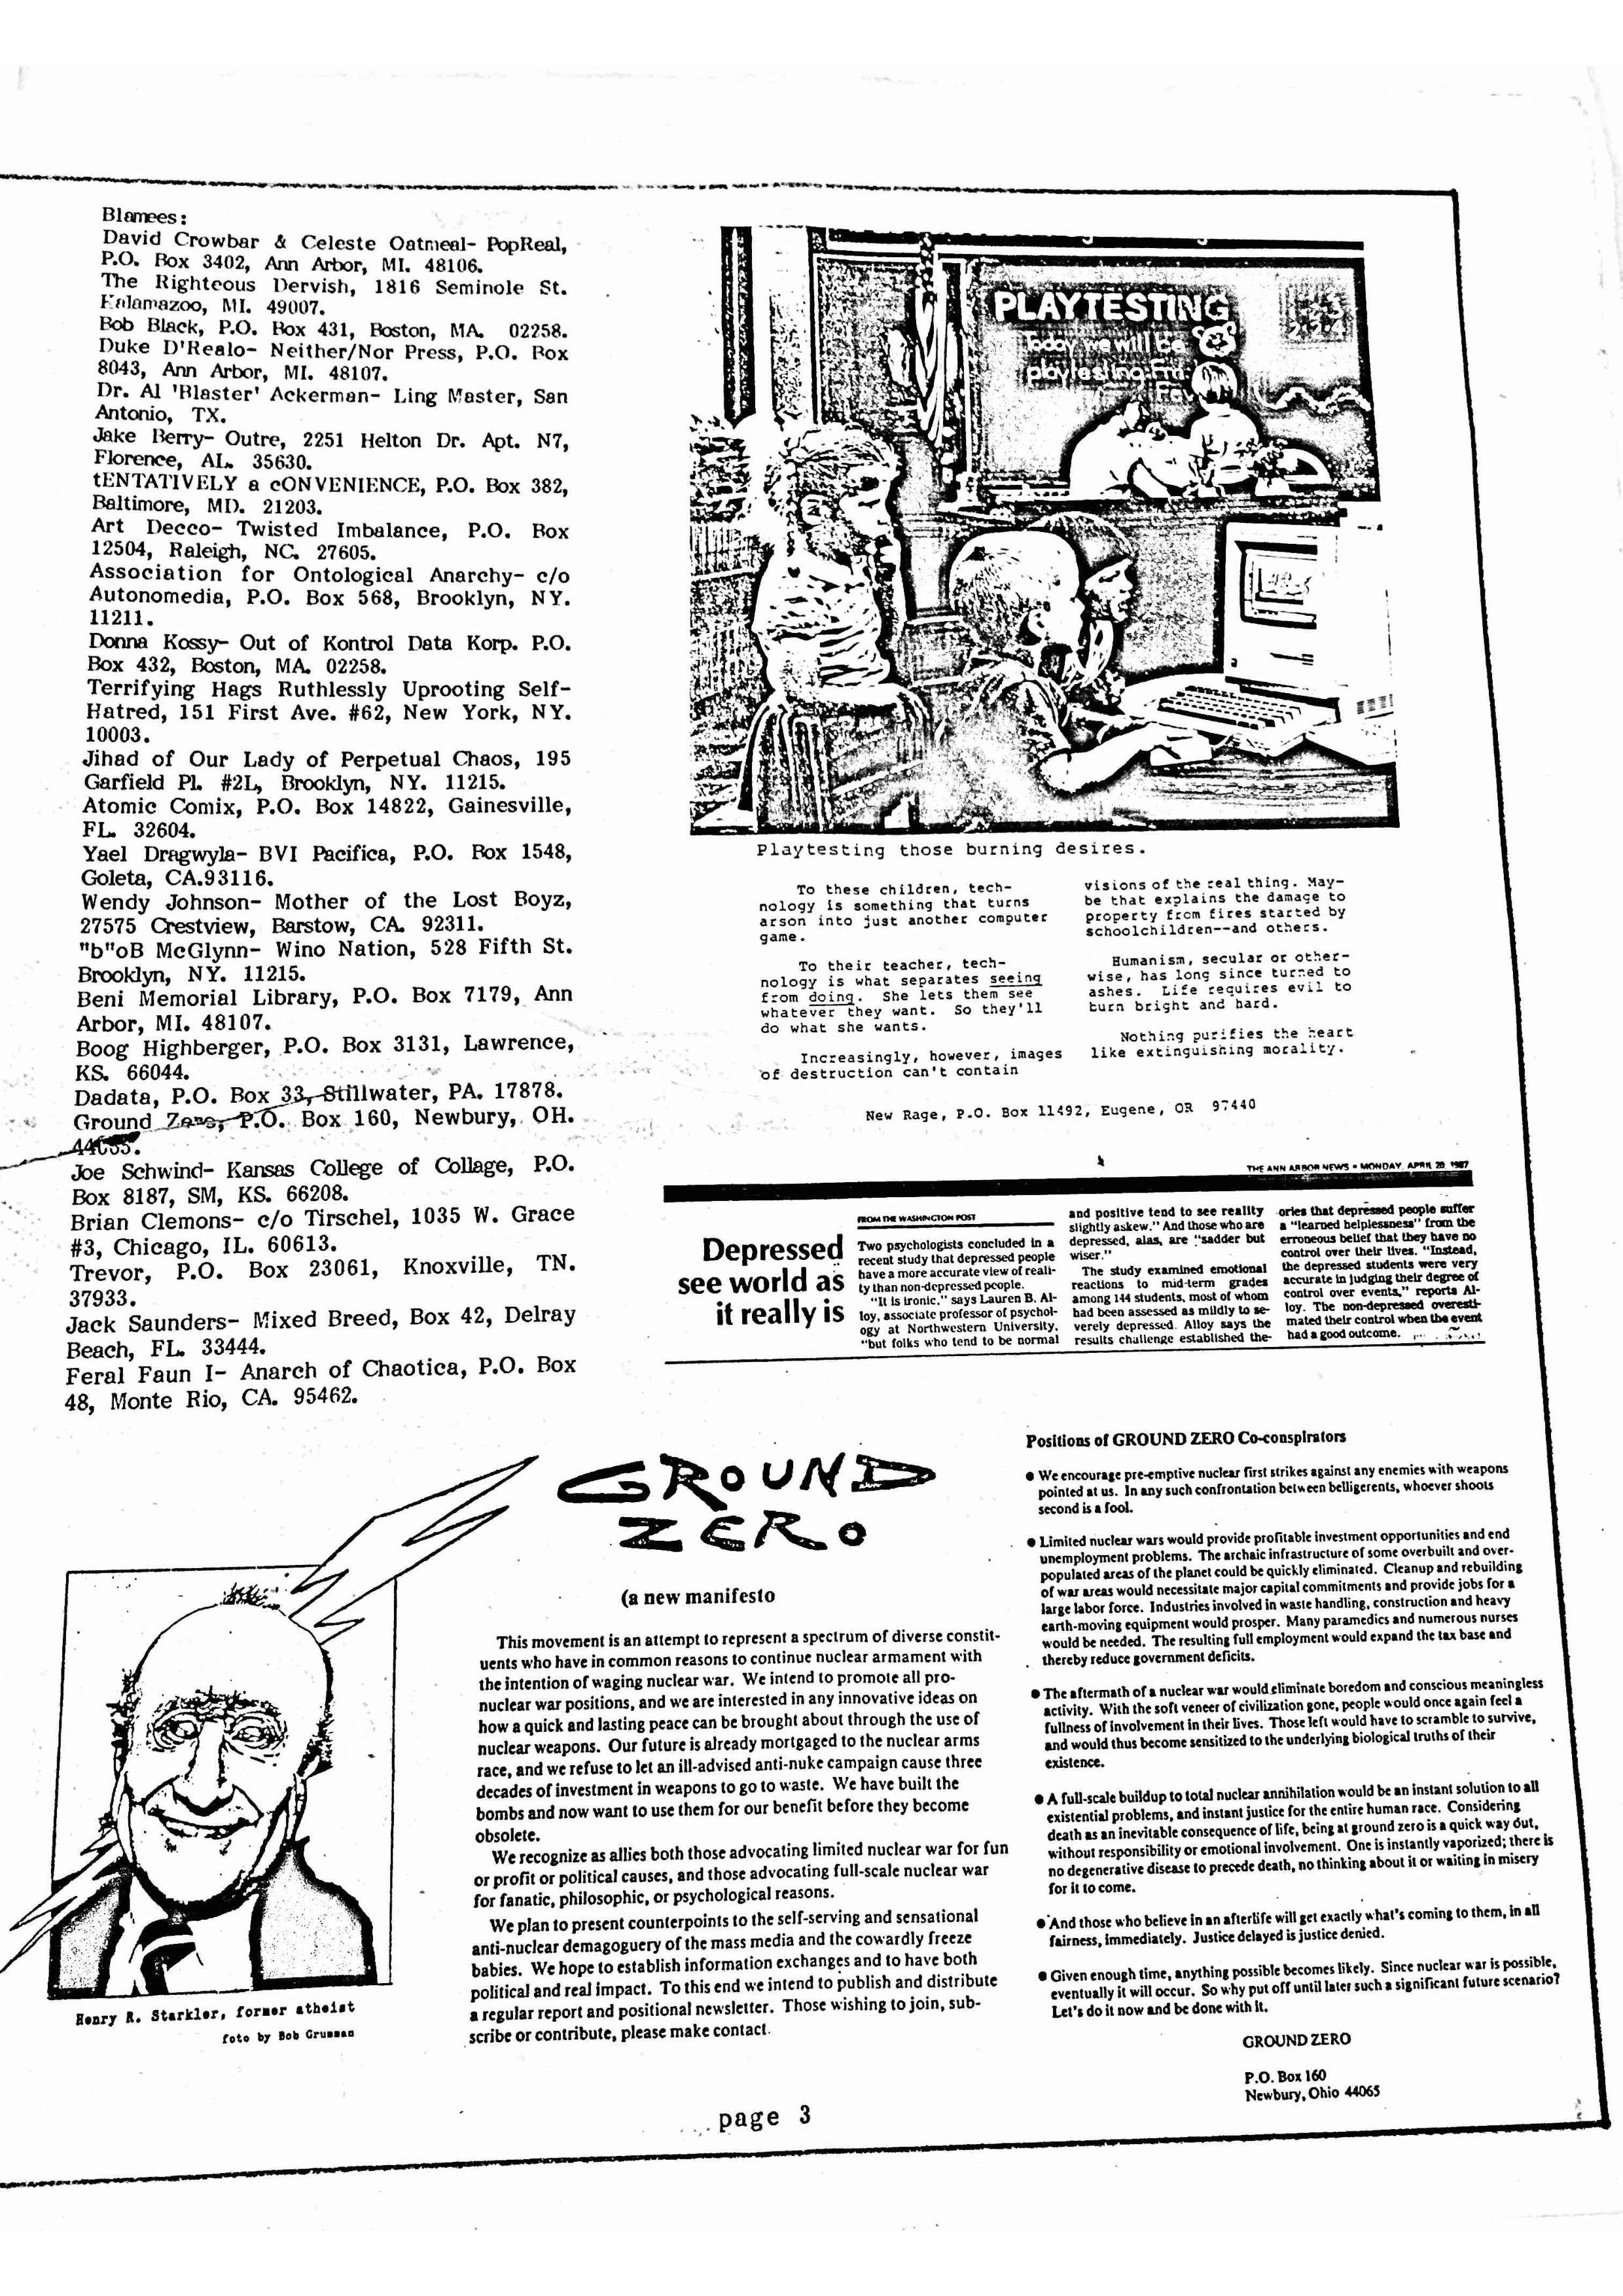 PopRealLast1-page-003.jpg